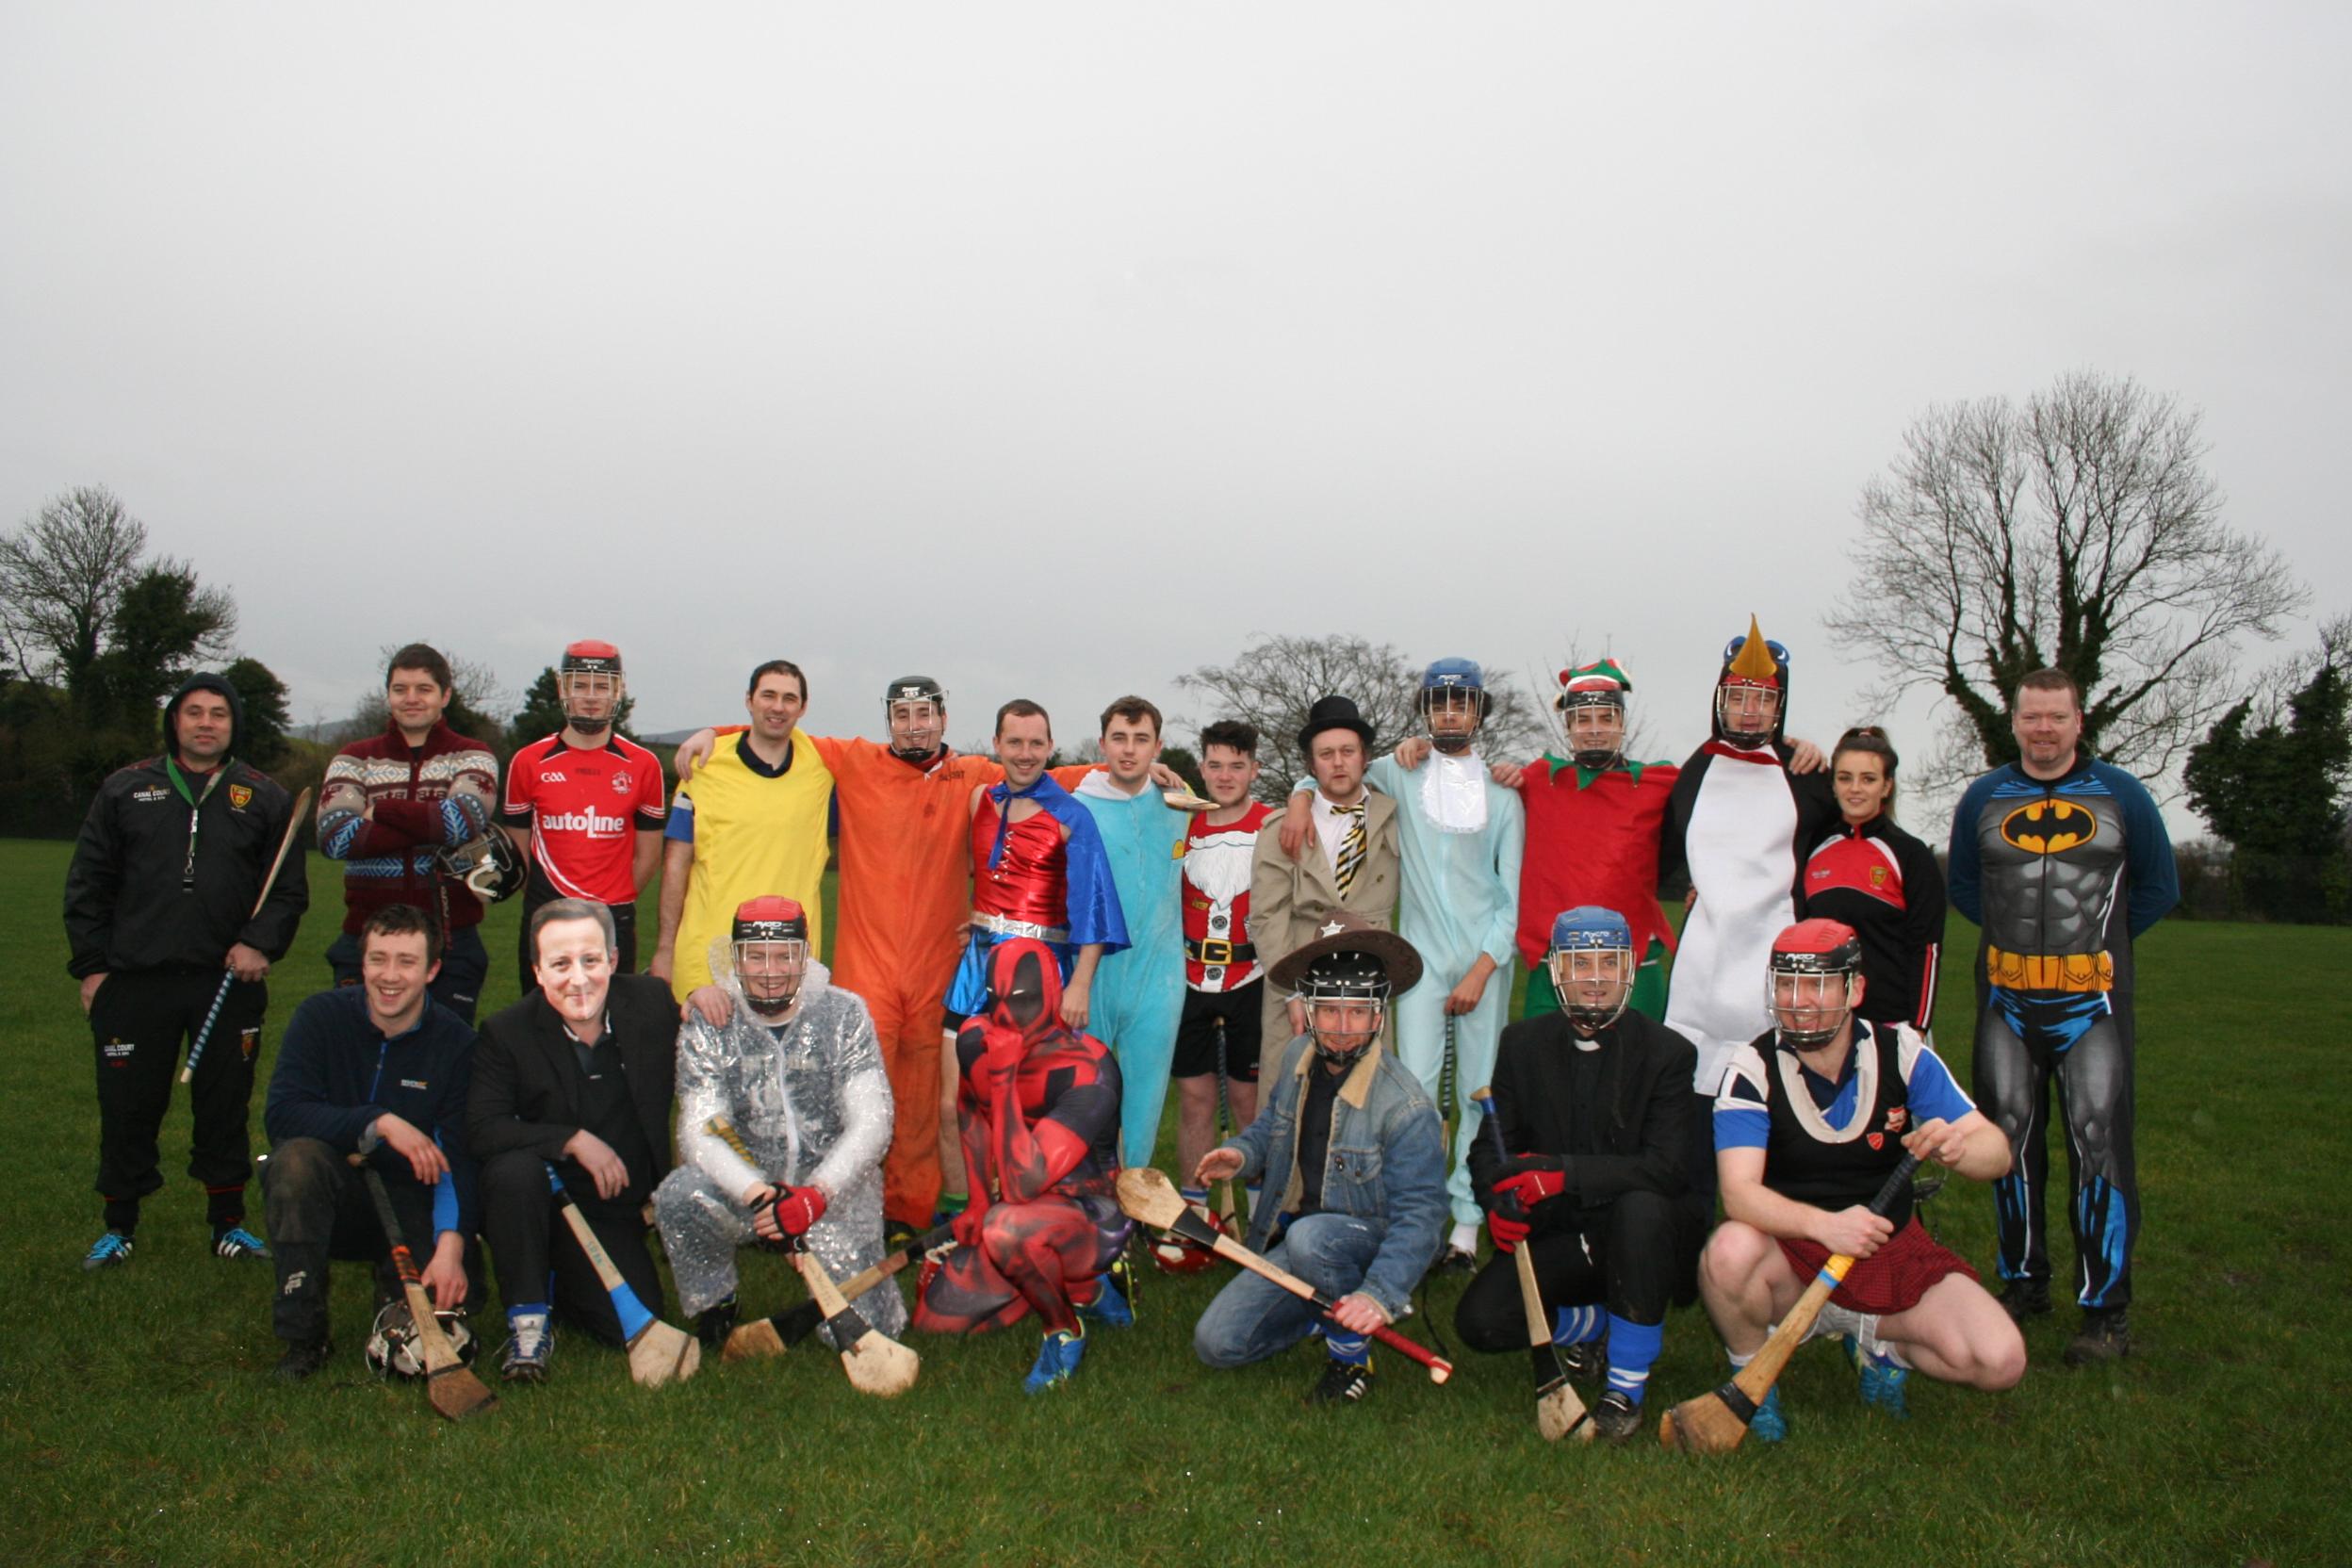 St Stephen's Day Fancy Dress Hurling match